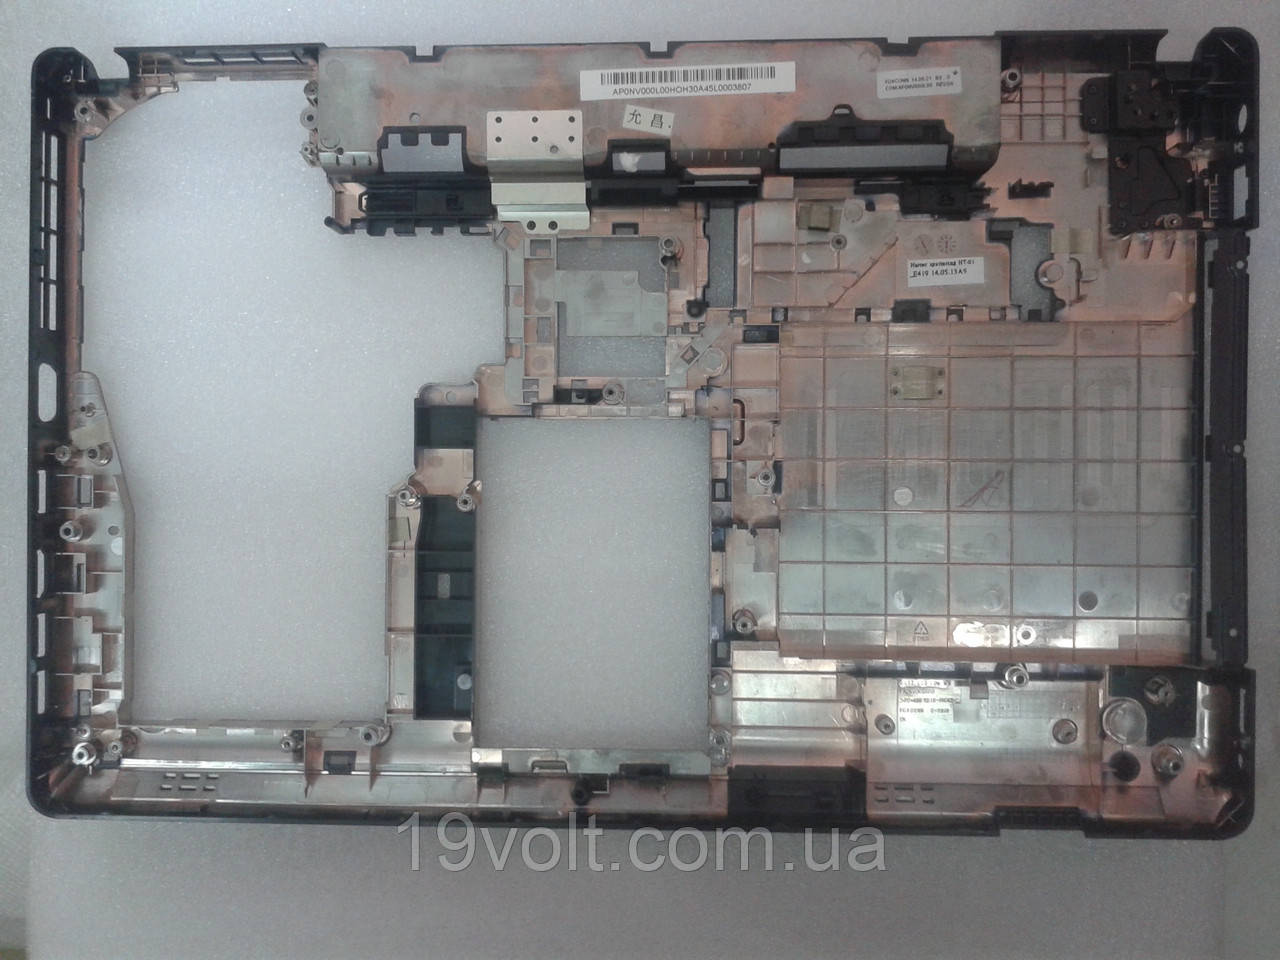 Нижня частина (корито) Lenovo ThinkPad E530